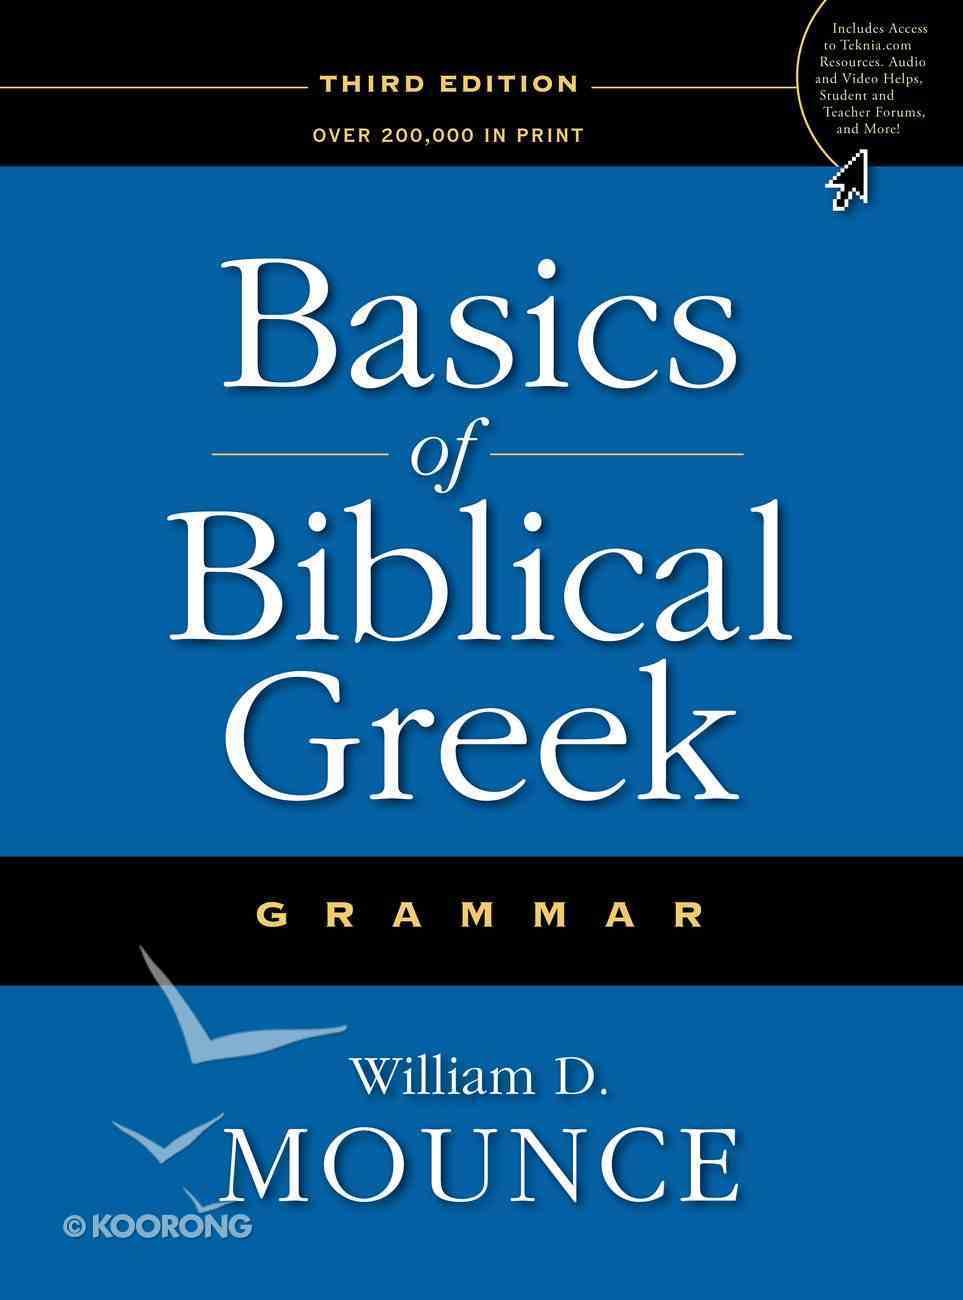 Basics of Biblical Greek Grammar (Zondervan Academic Course Dvd Study Series) eBook